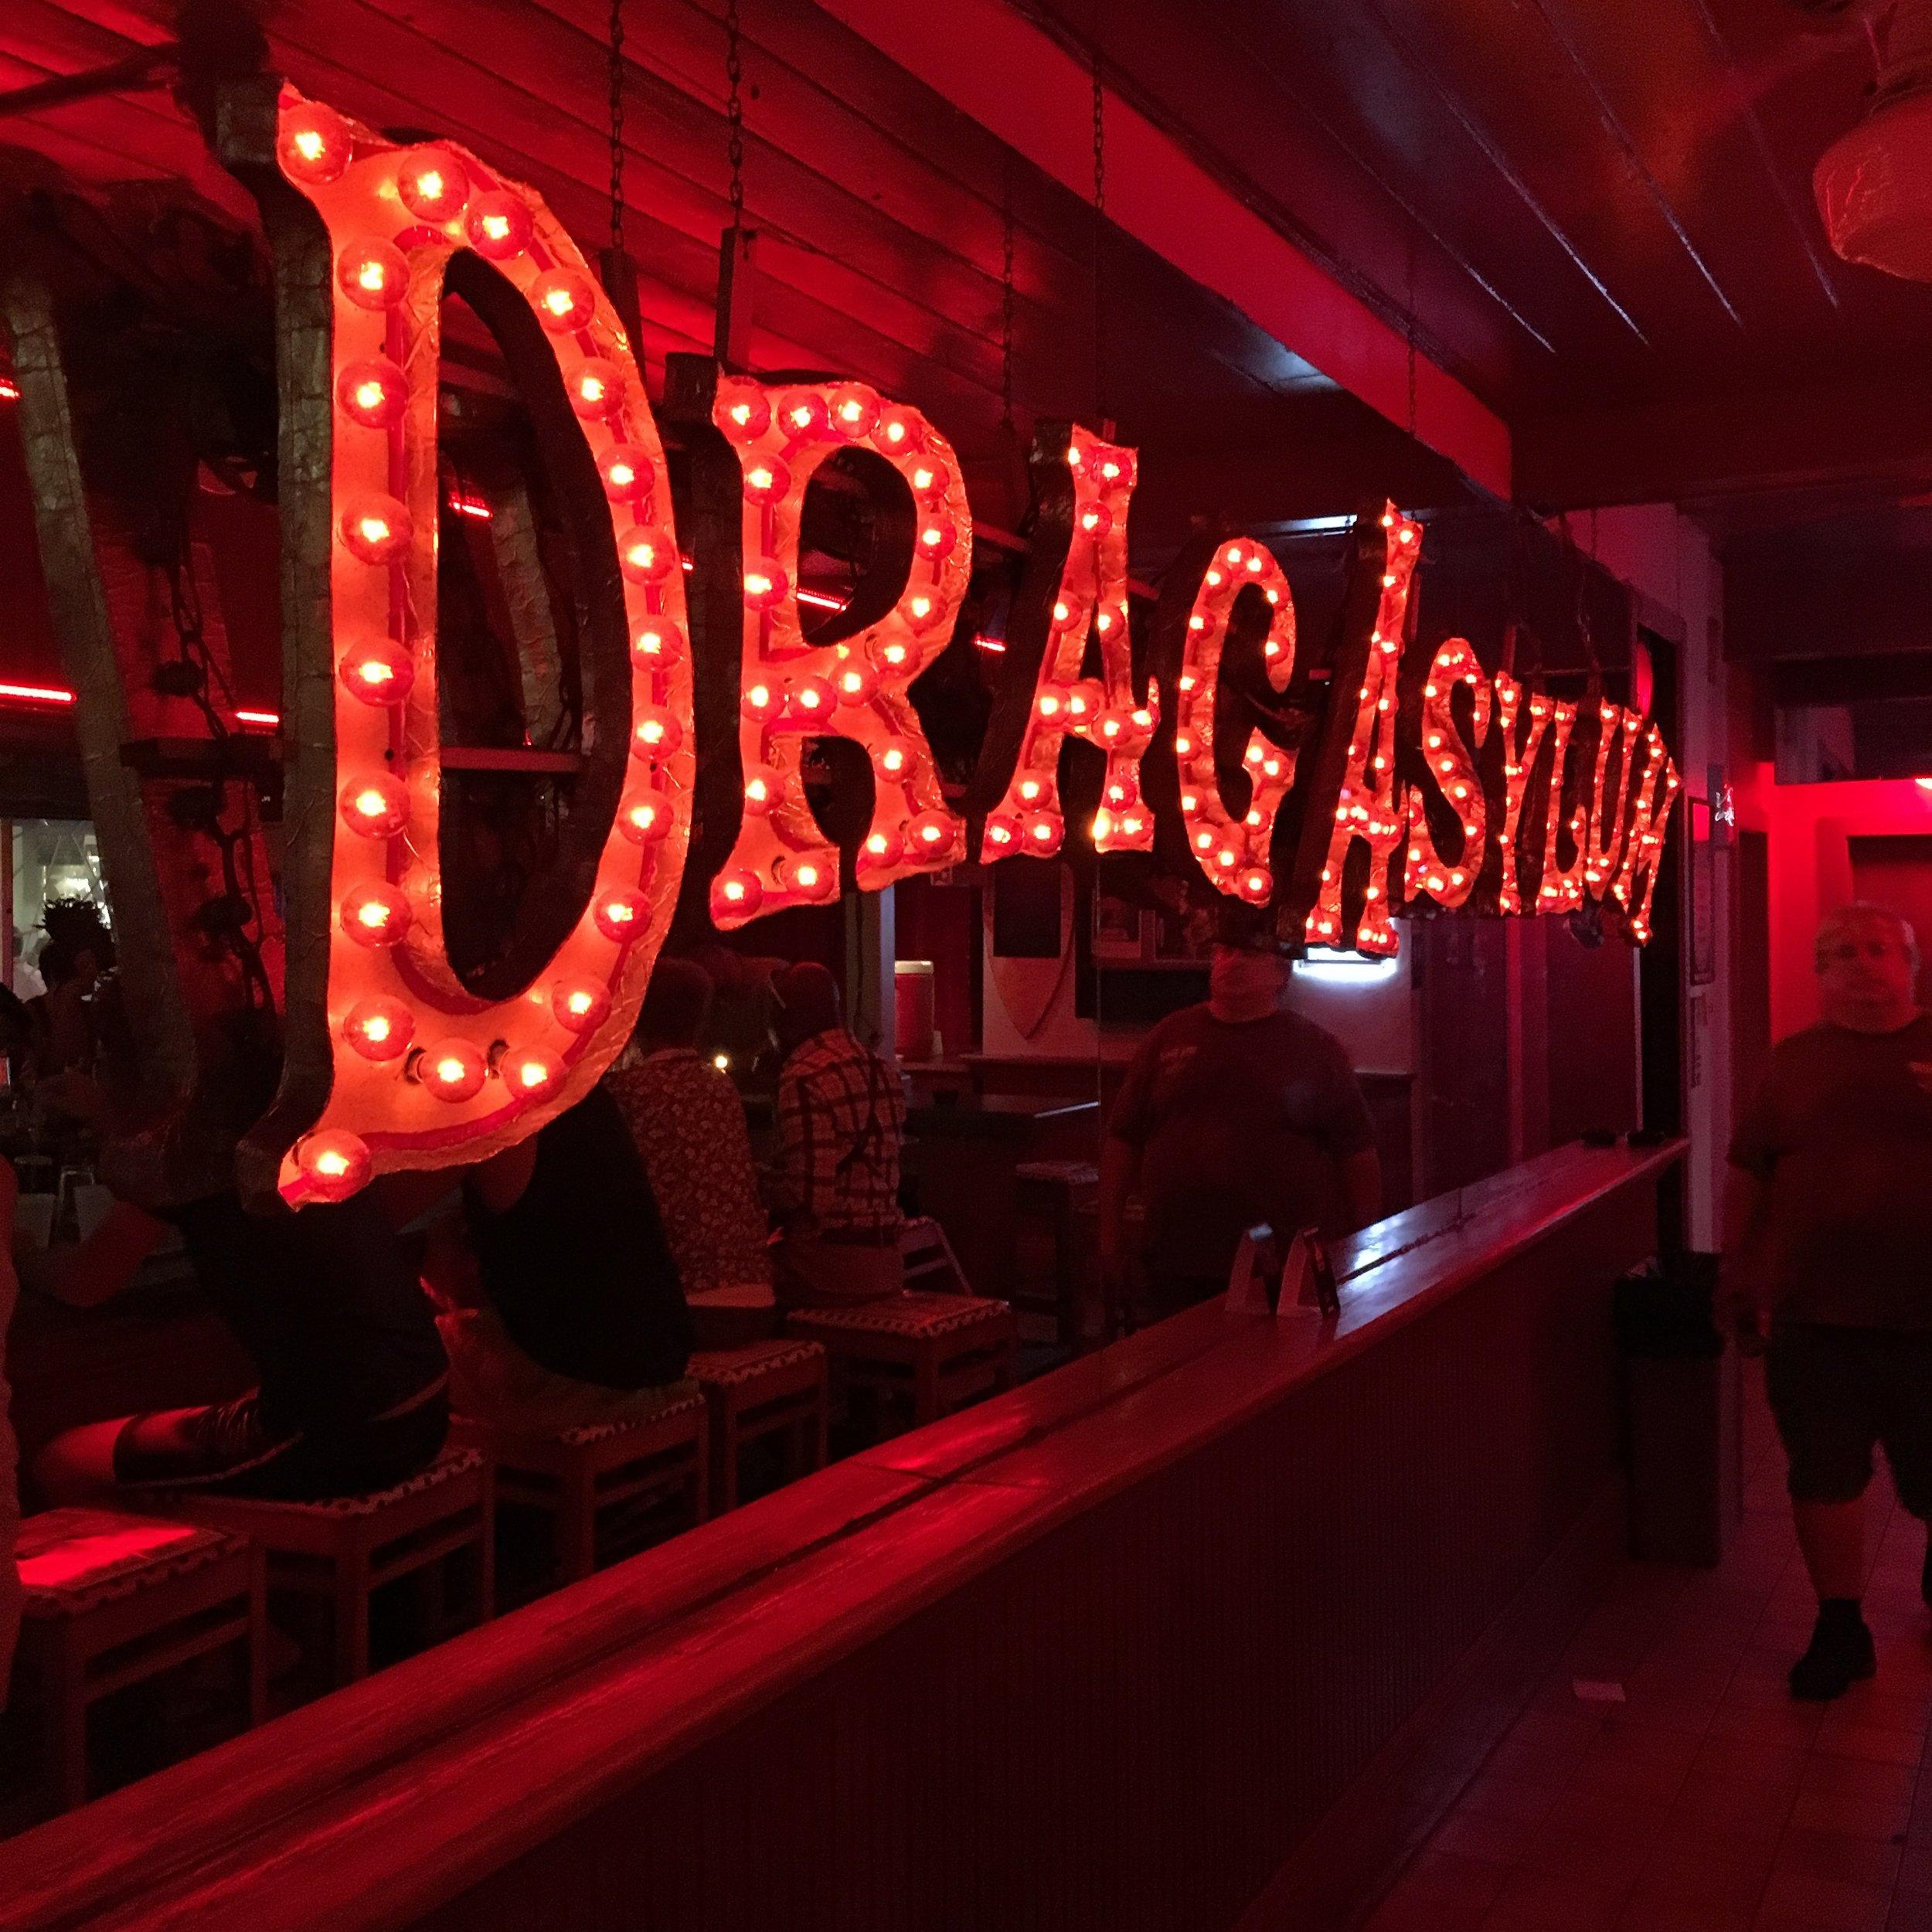 801 bourbon street key west bar sign iit drag aslyum